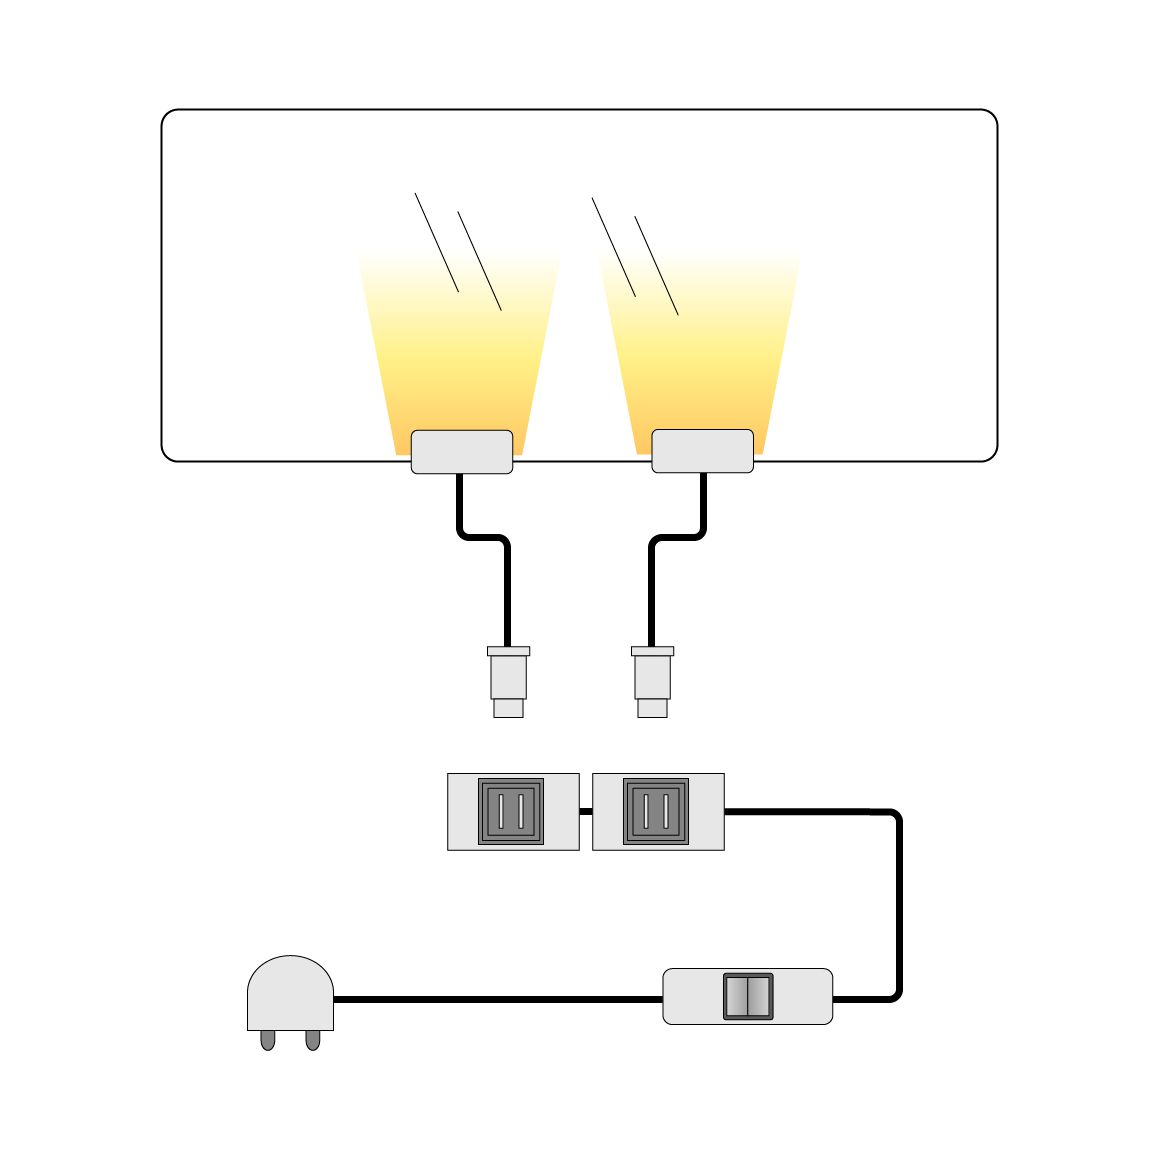 Image of energia A+, Illuminazioni LED per bordi in vetro Liebenwalde (set da 2) - Set da 2, mooved